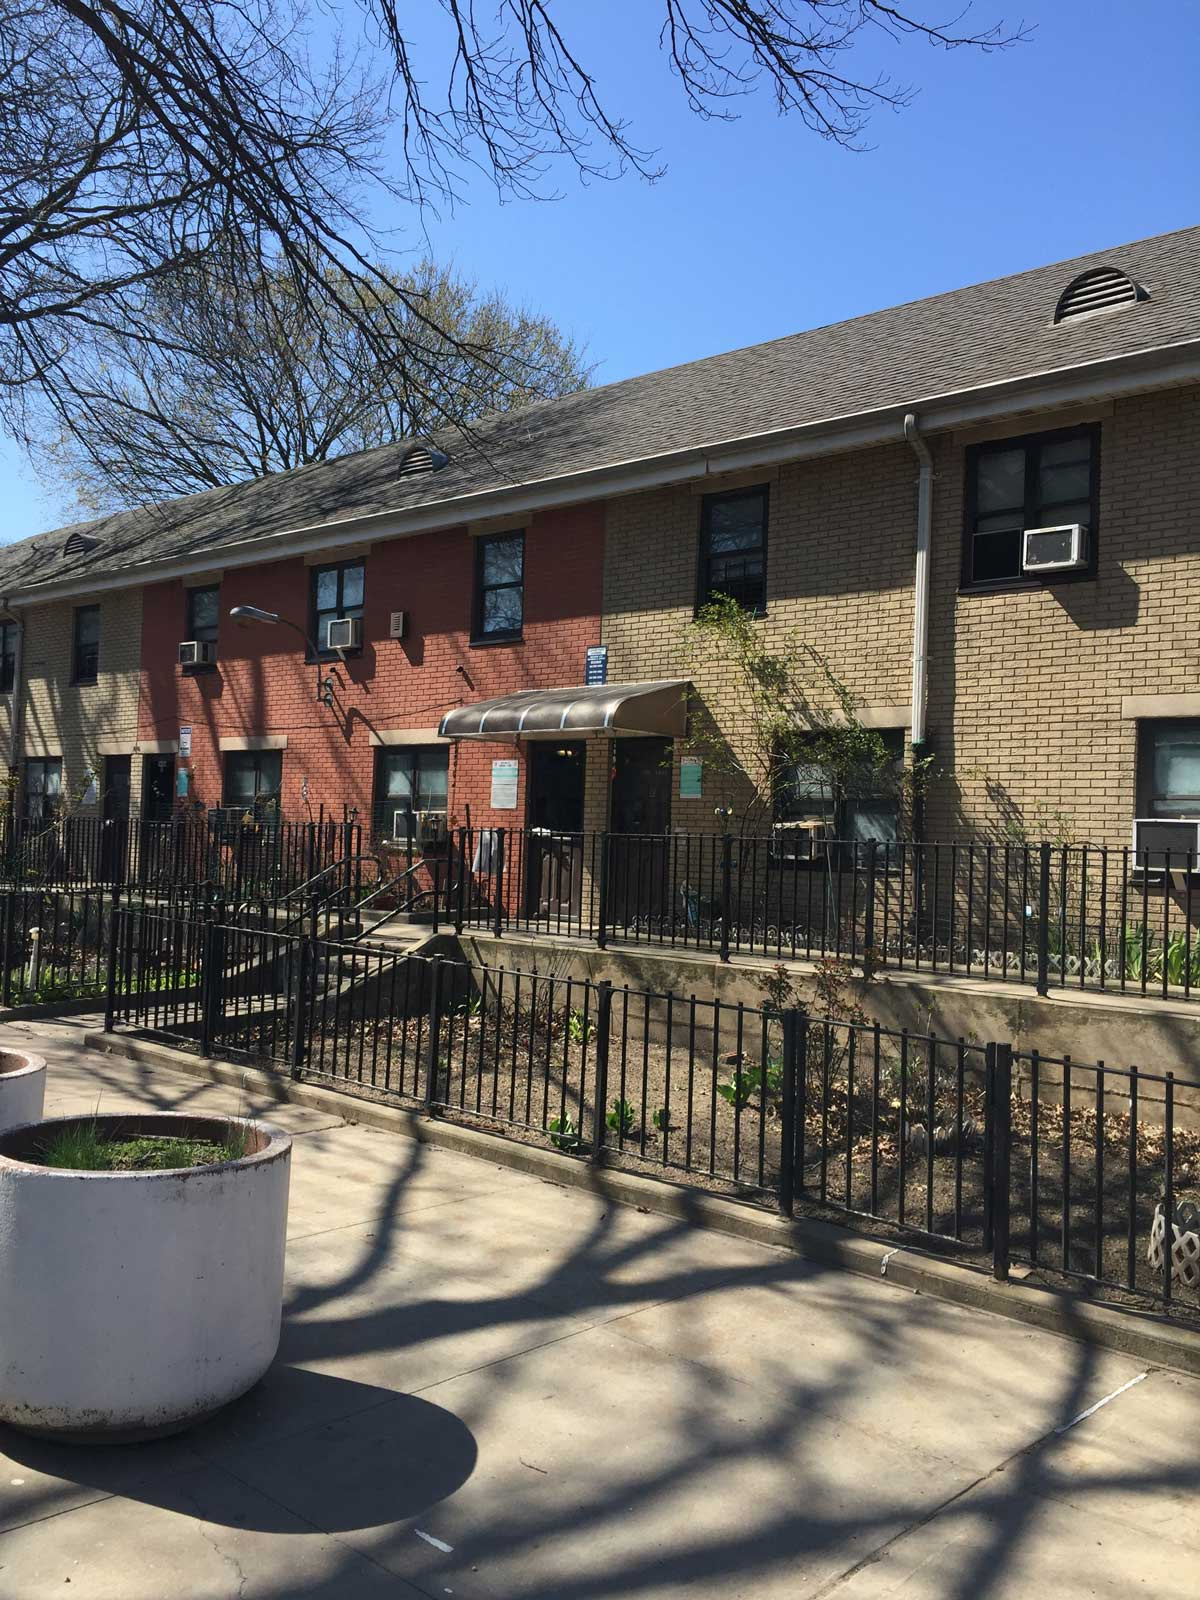 Three-story brick private dwelling